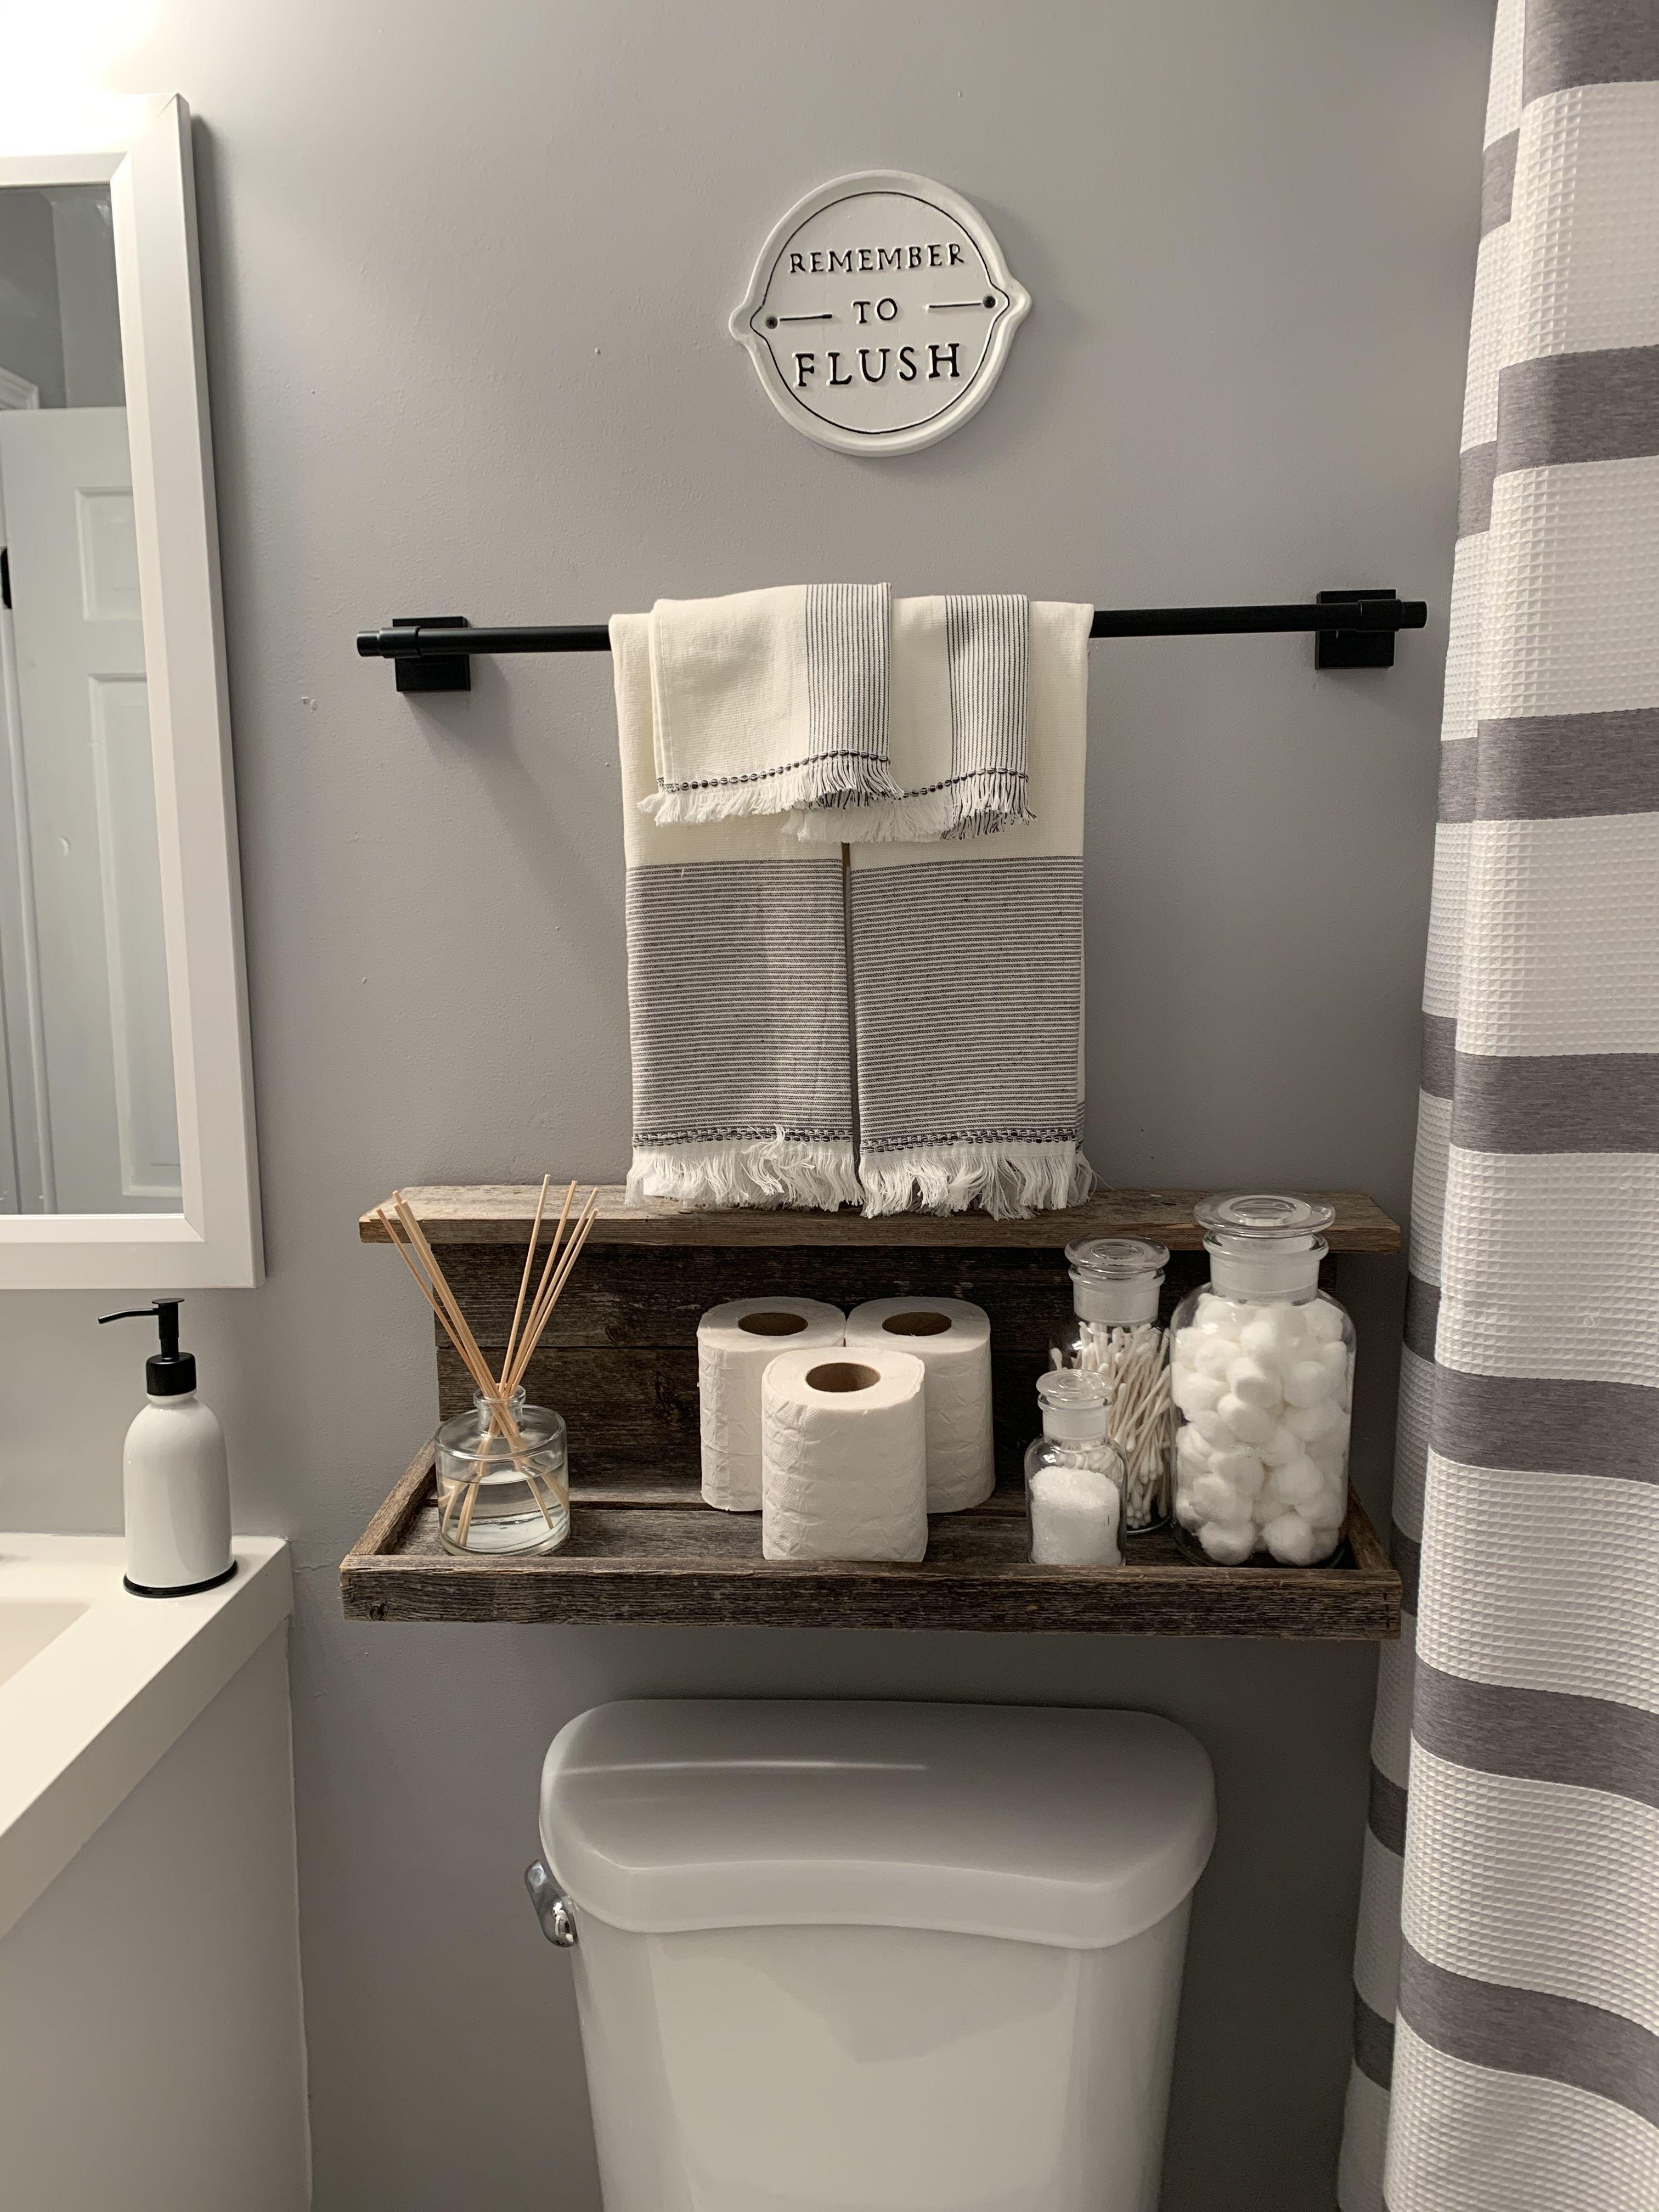 Rustic Bathroom Small Bathroom Decor Magnolia Bathroom Hearth And Hand Bathroom decor at target